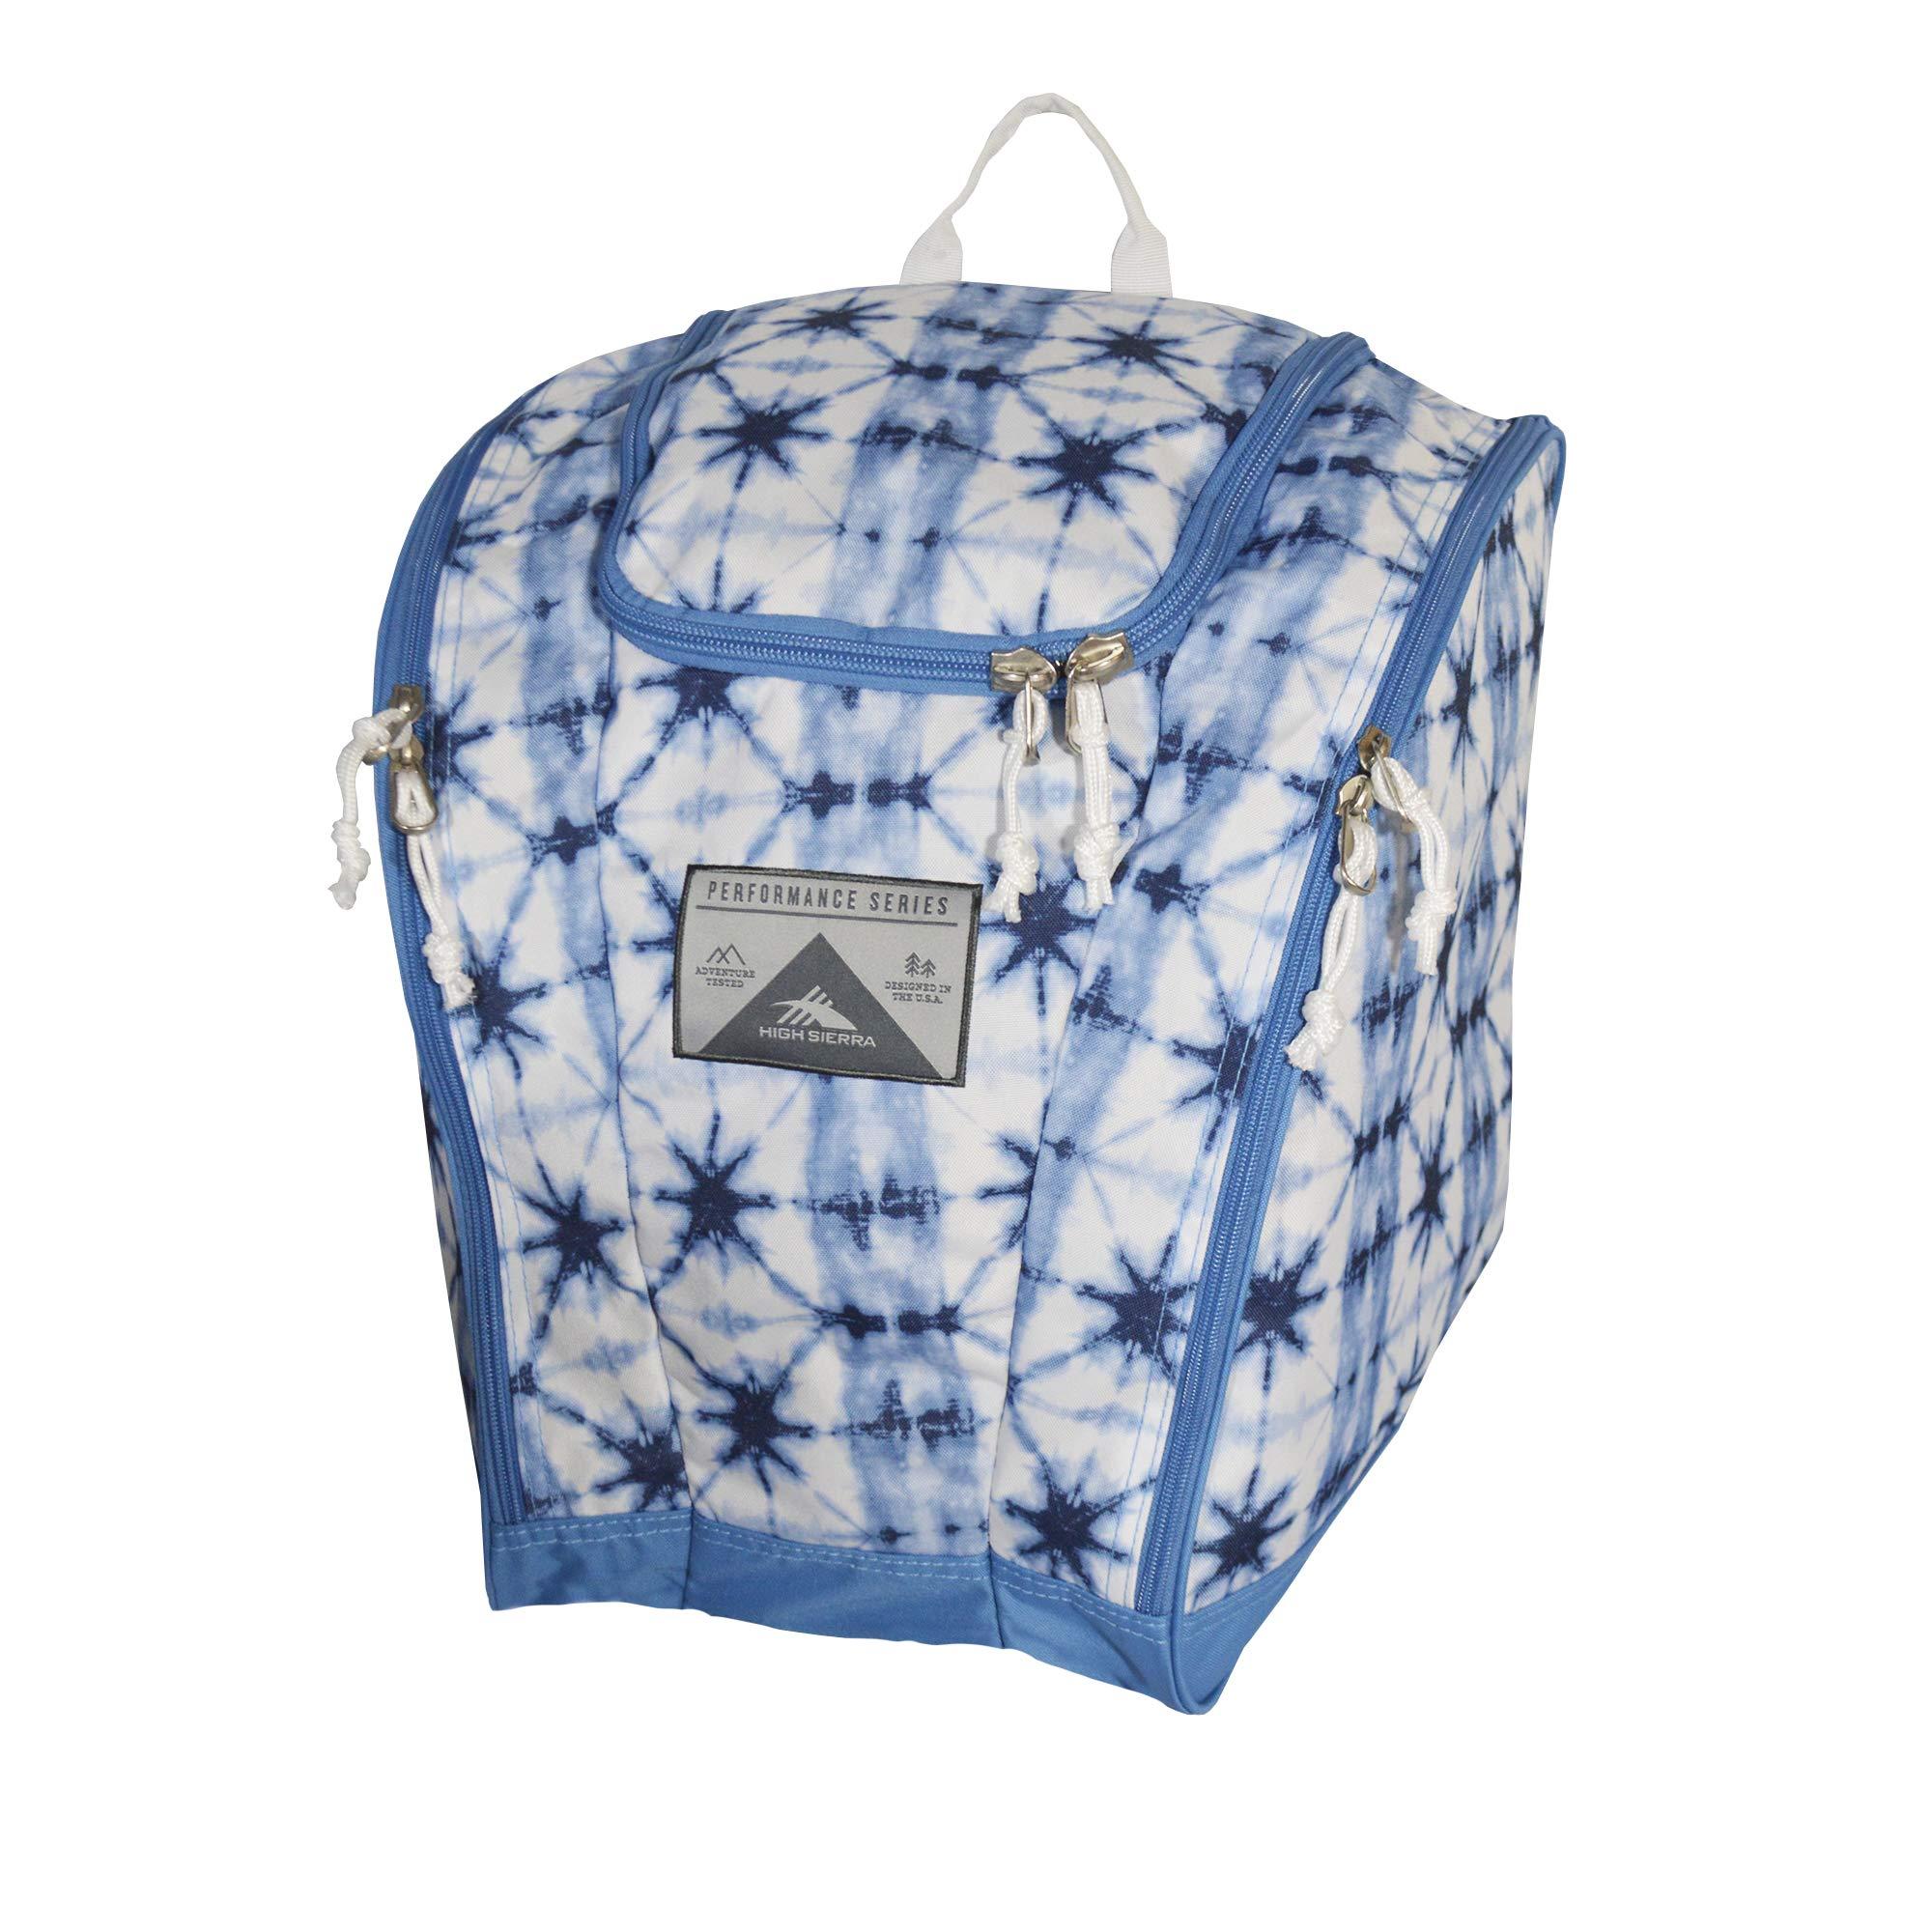 High Sierra Ski Boot Trapezoid Boot Bag, Indigo Dye/Mineral/White